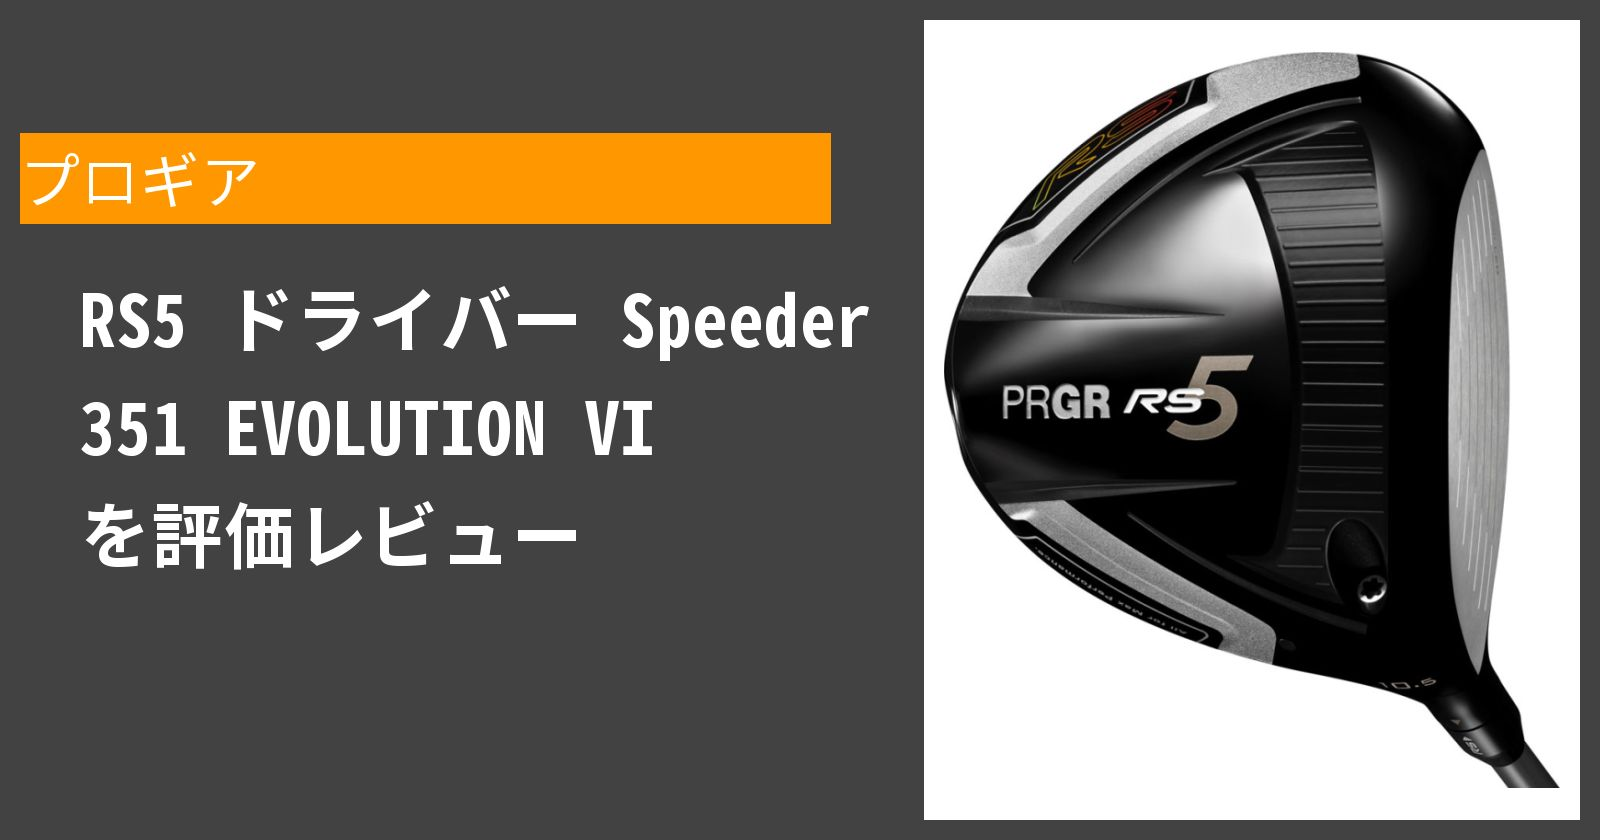 RS5 ドライバー Speeder 351 EVOLUTION VIを徹底評価